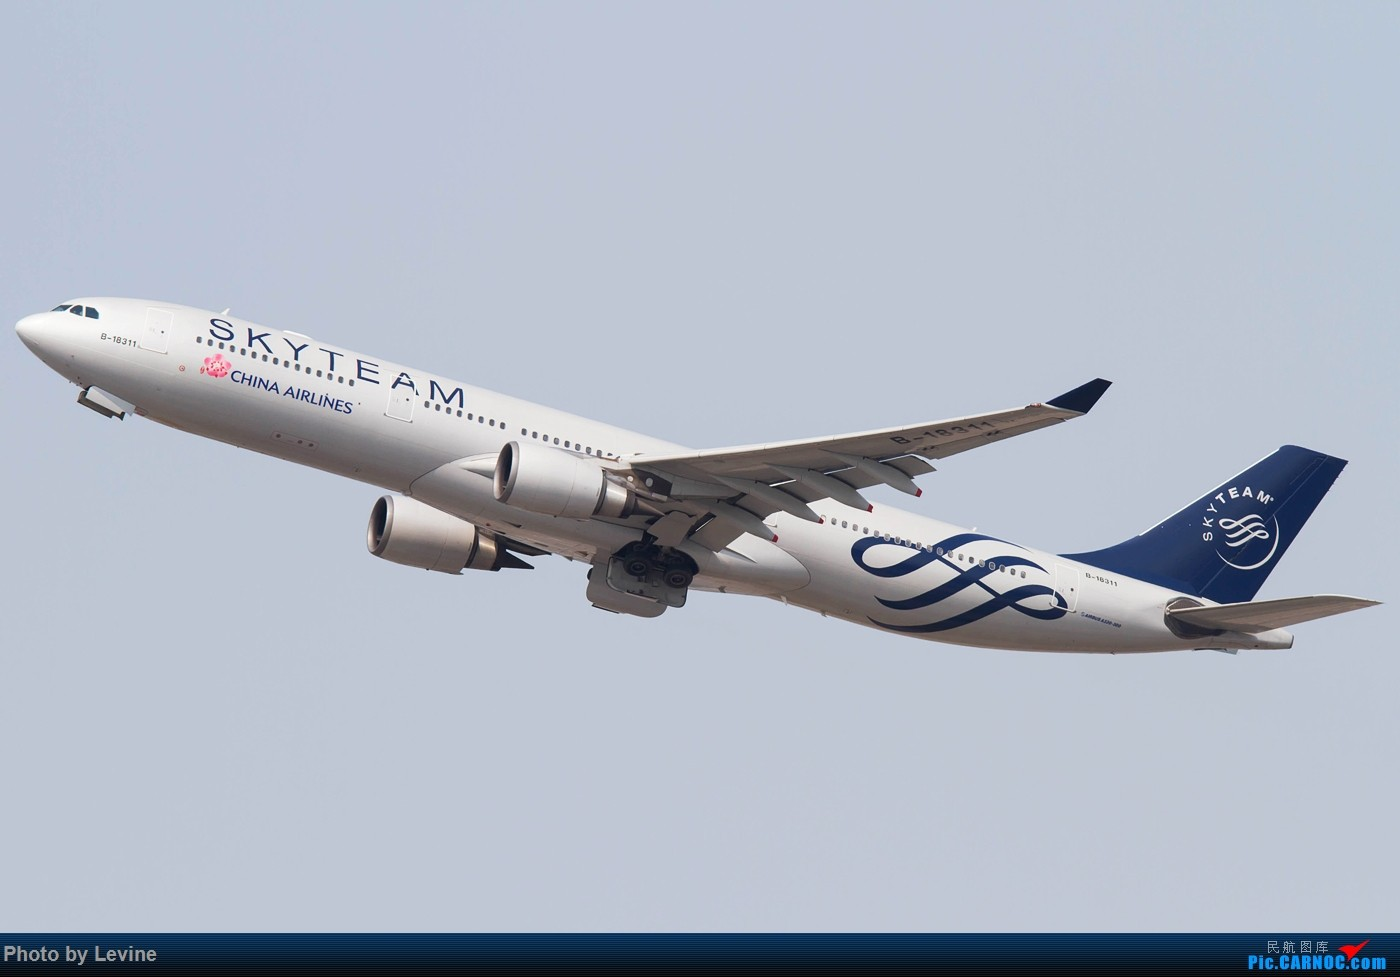 Re:[原创]今冬沙螺湾 迟来的图片 AIRBUS A330-300 B-18311 中国香港国际机场